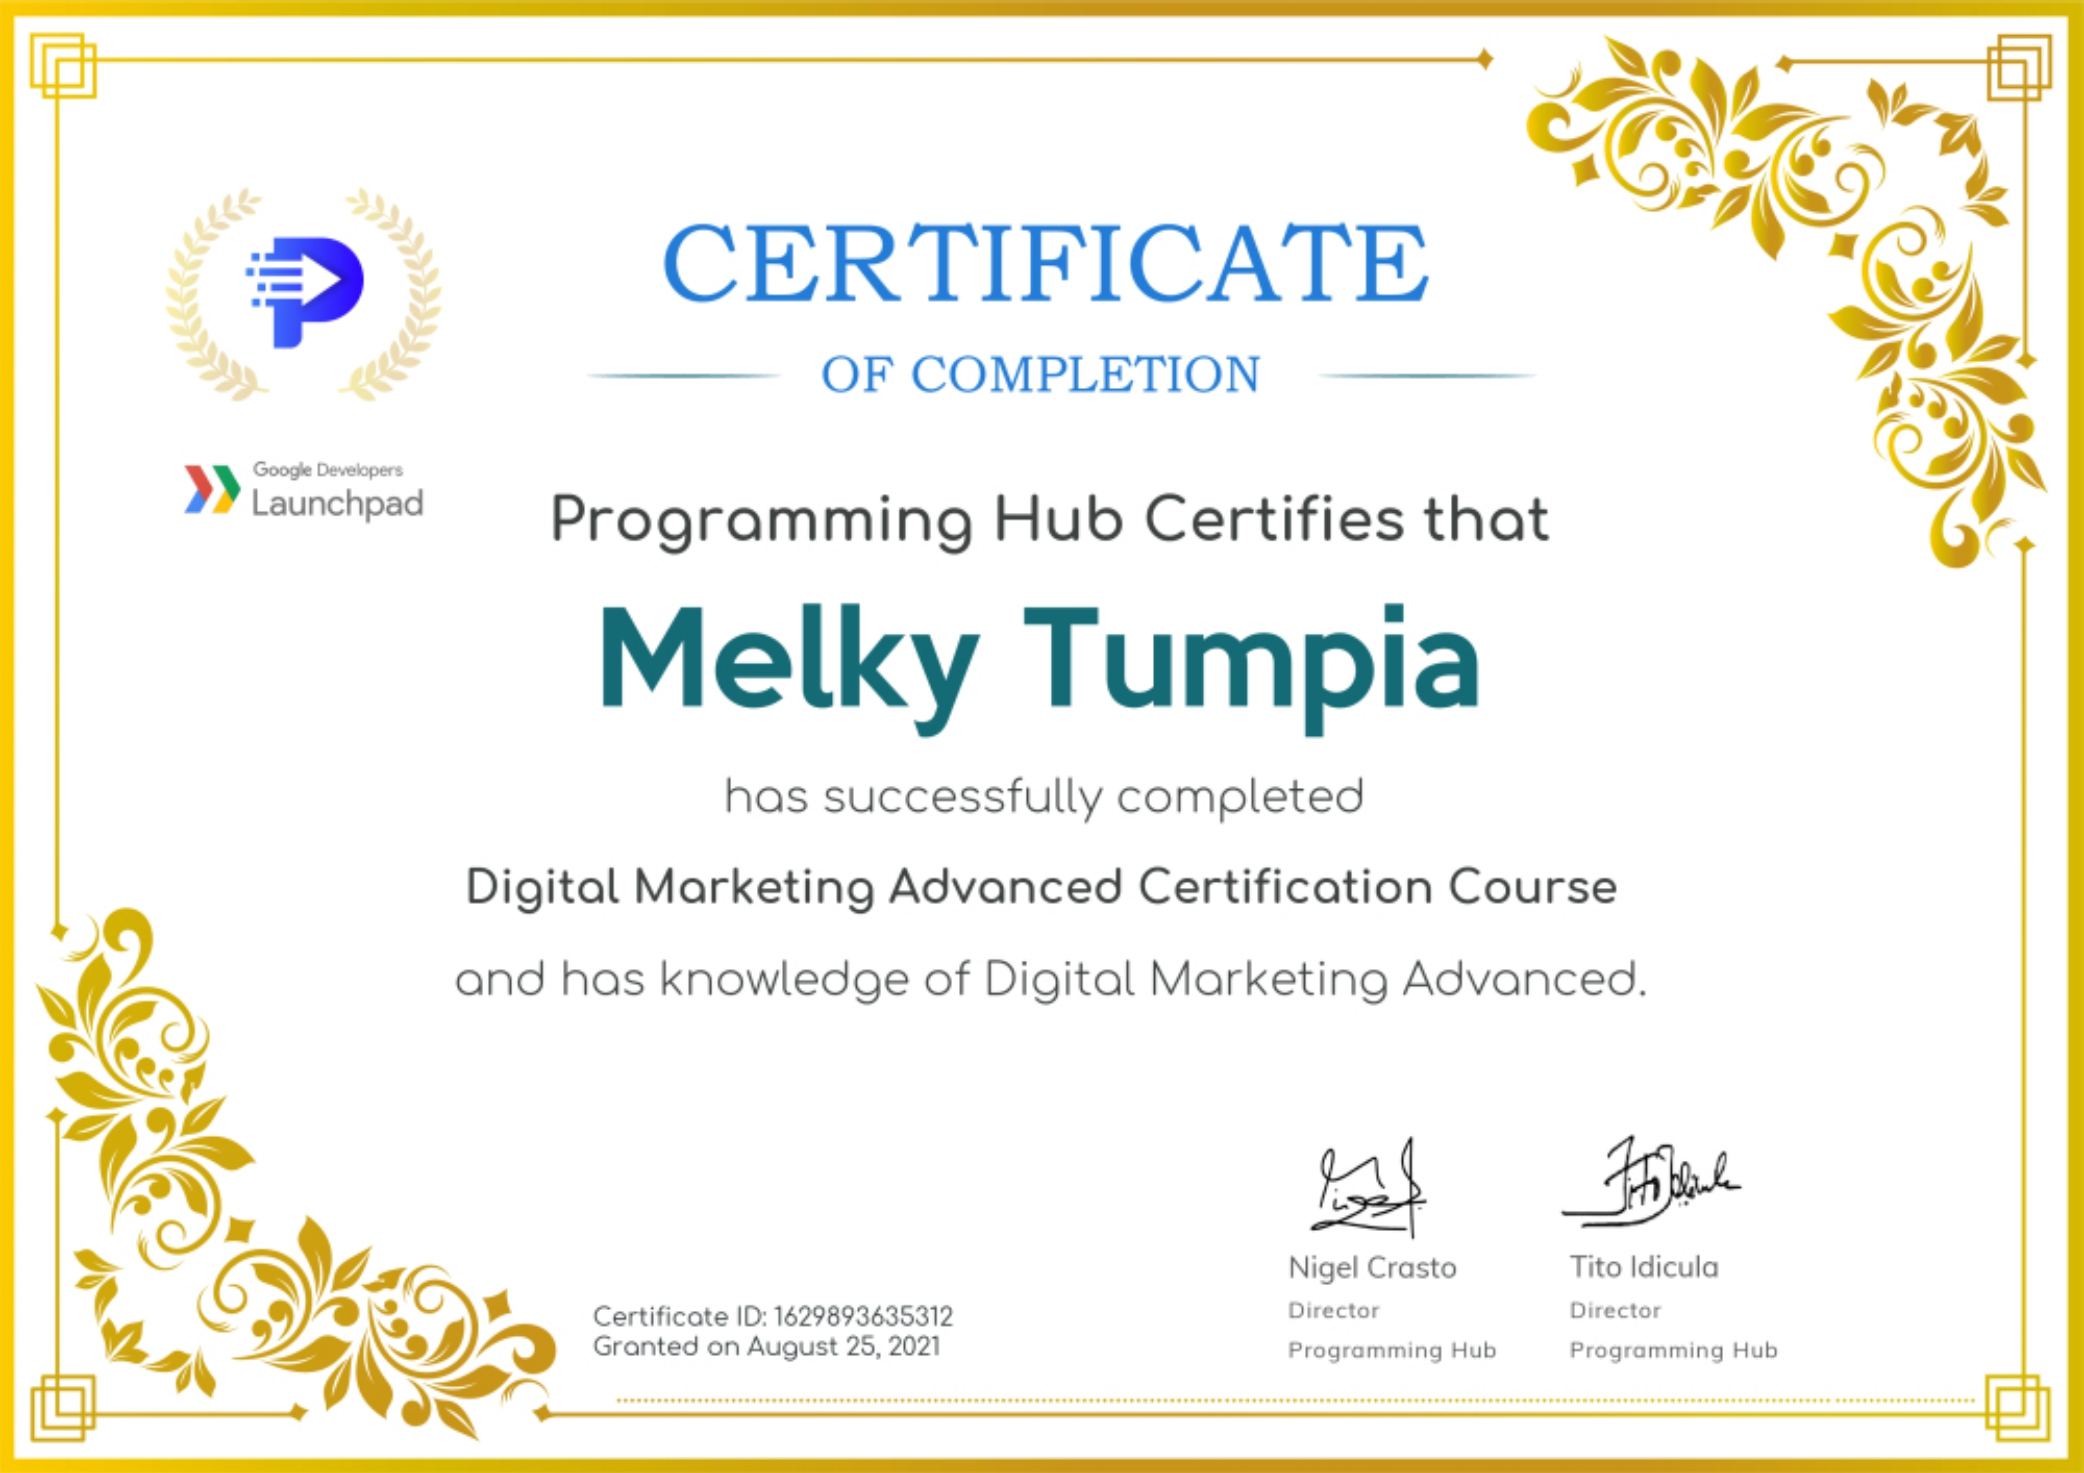 Digital Marketing Advanced Certification